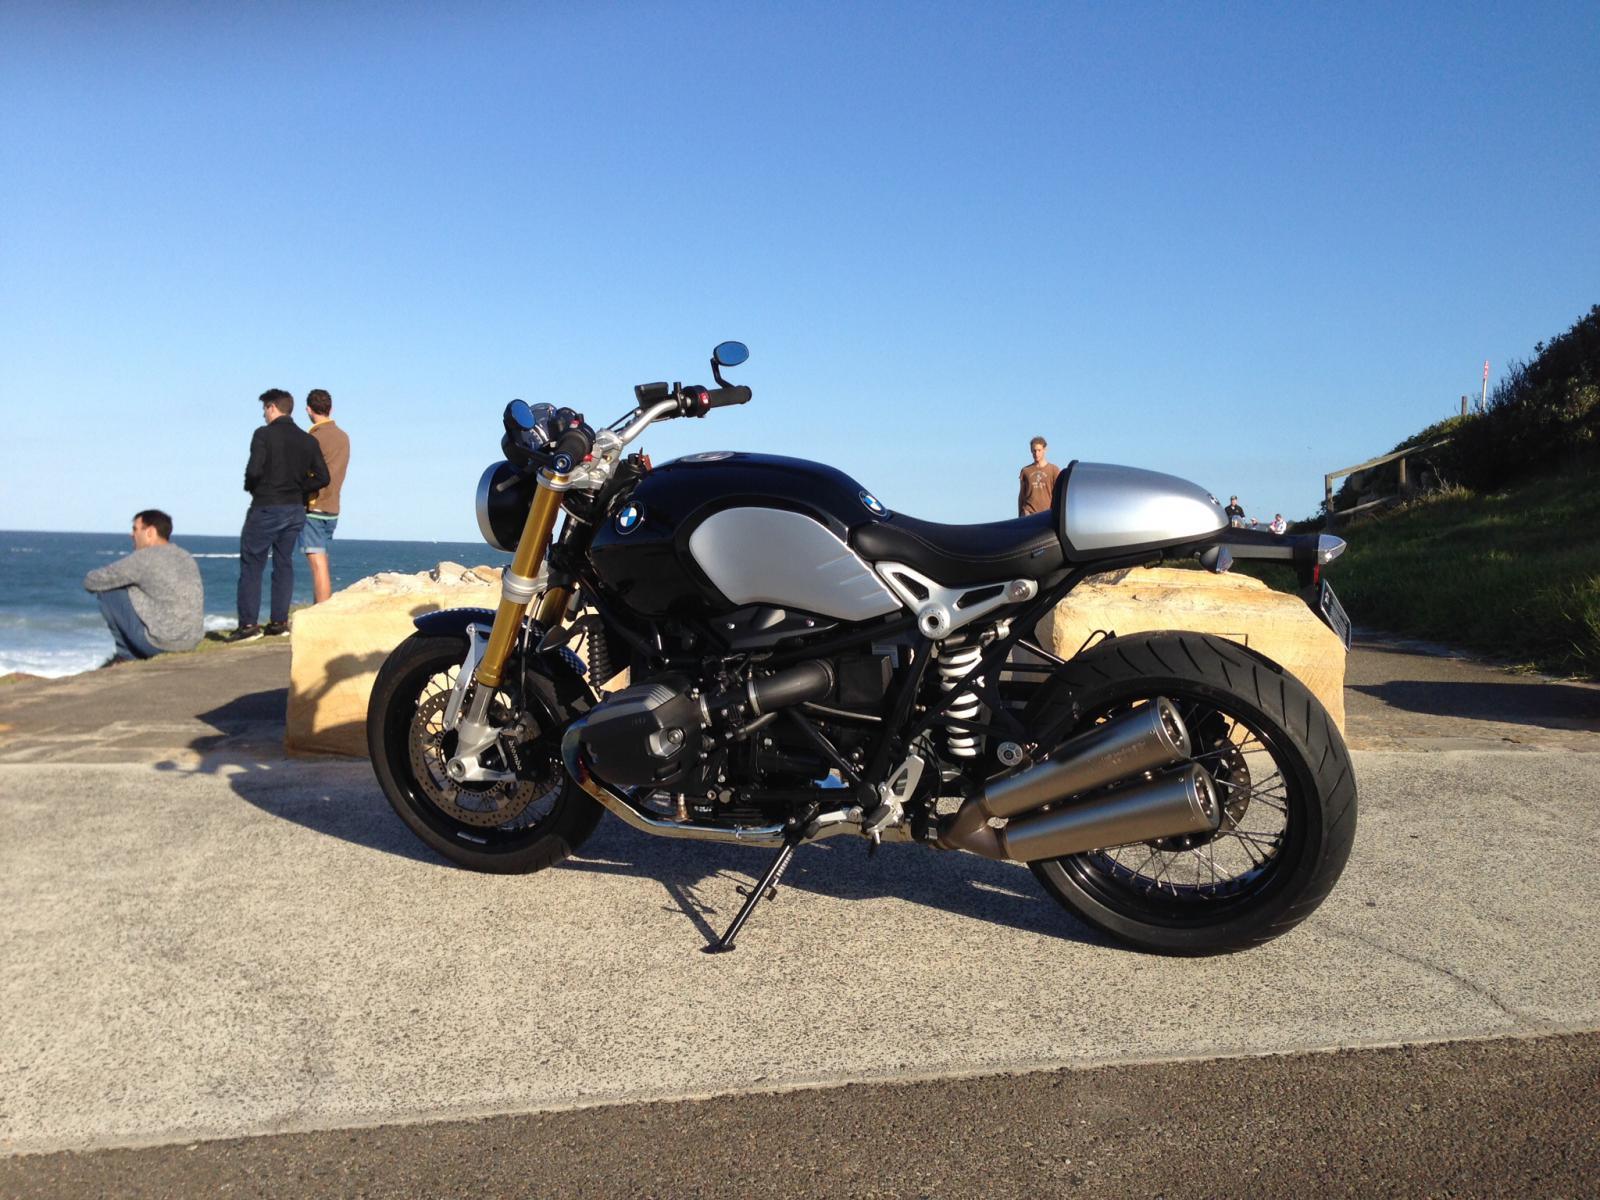 Sierra Bmw Sparks Nevada Sierra Bmw Motorcycle Reno Sparks Lake Tahoe Nevada Bmw Riders